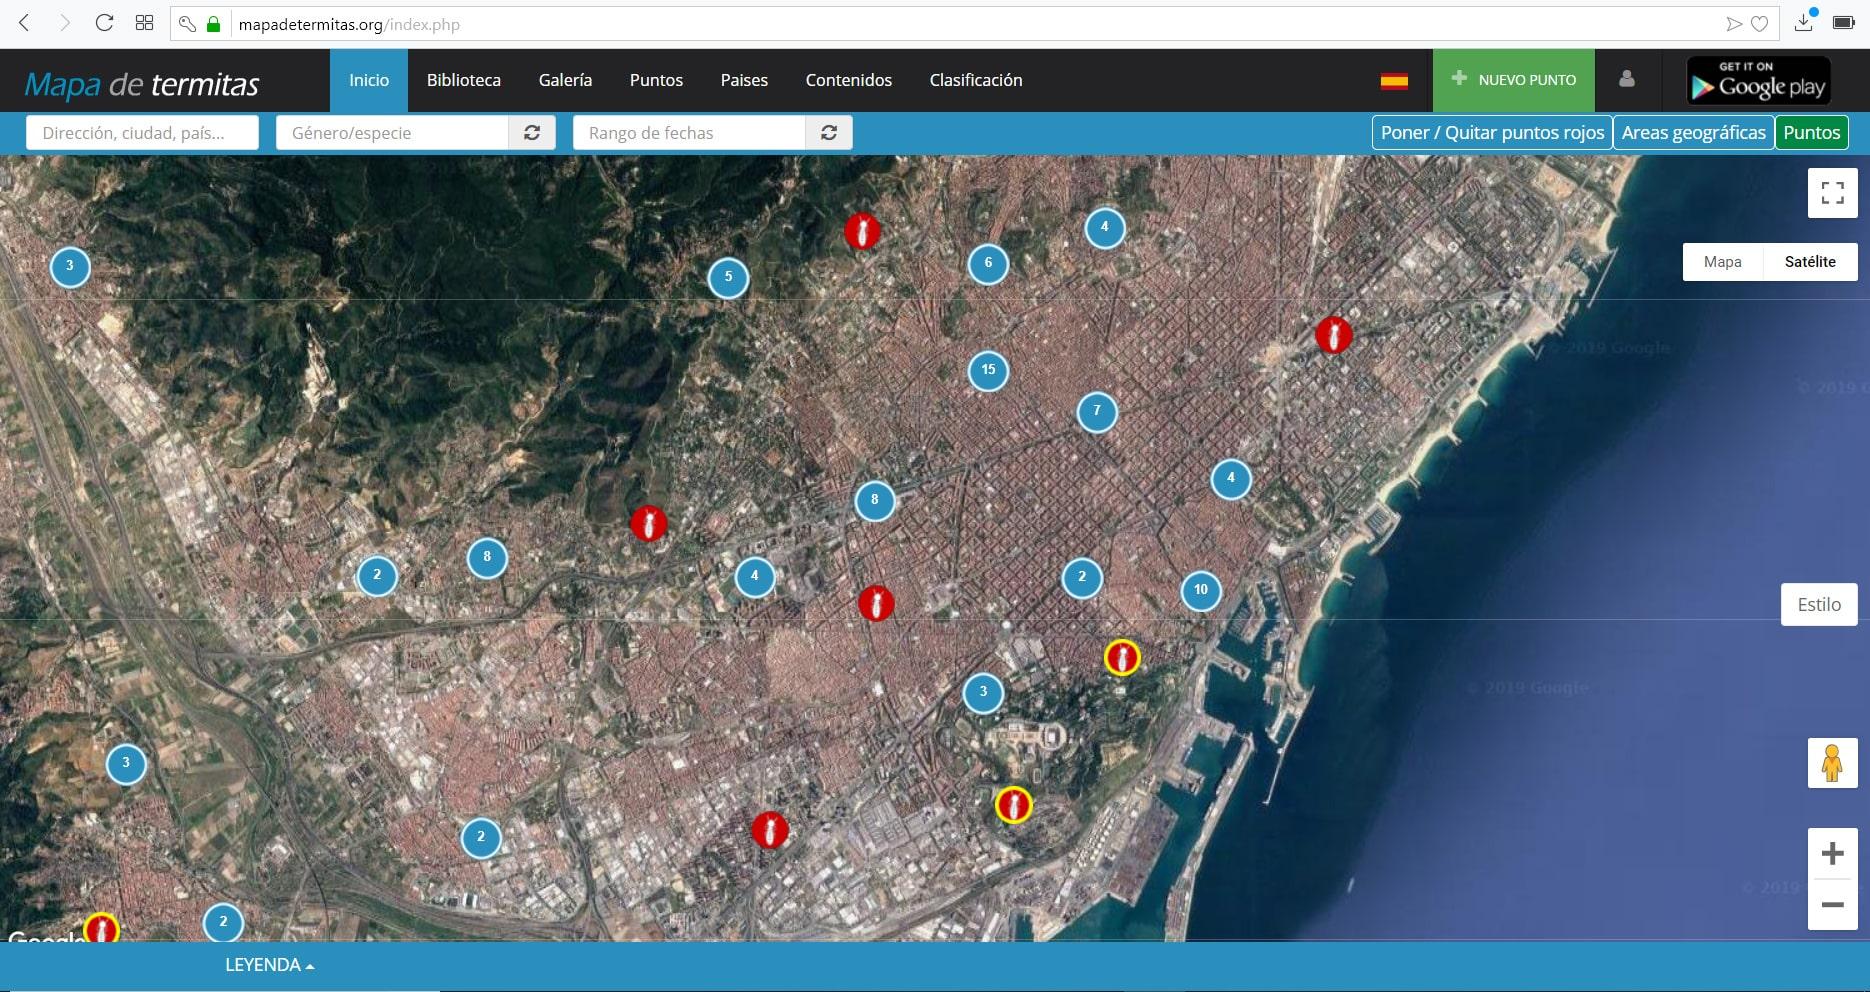 mapa-de-termitas-espana